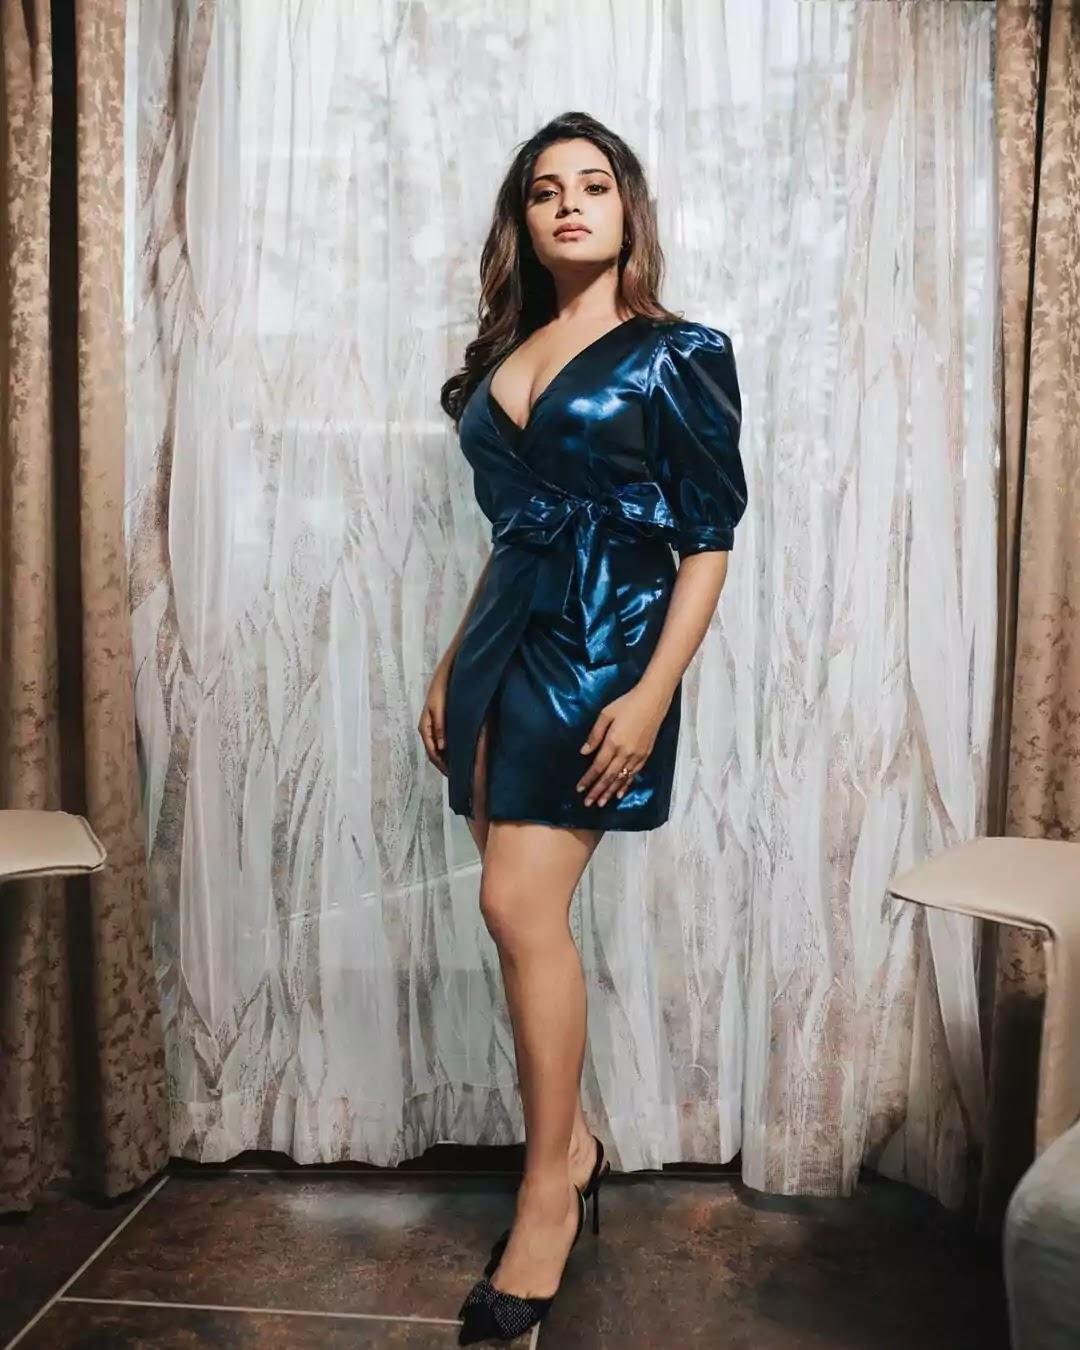 aathmika-hot-looks-in-blue-mini-dress